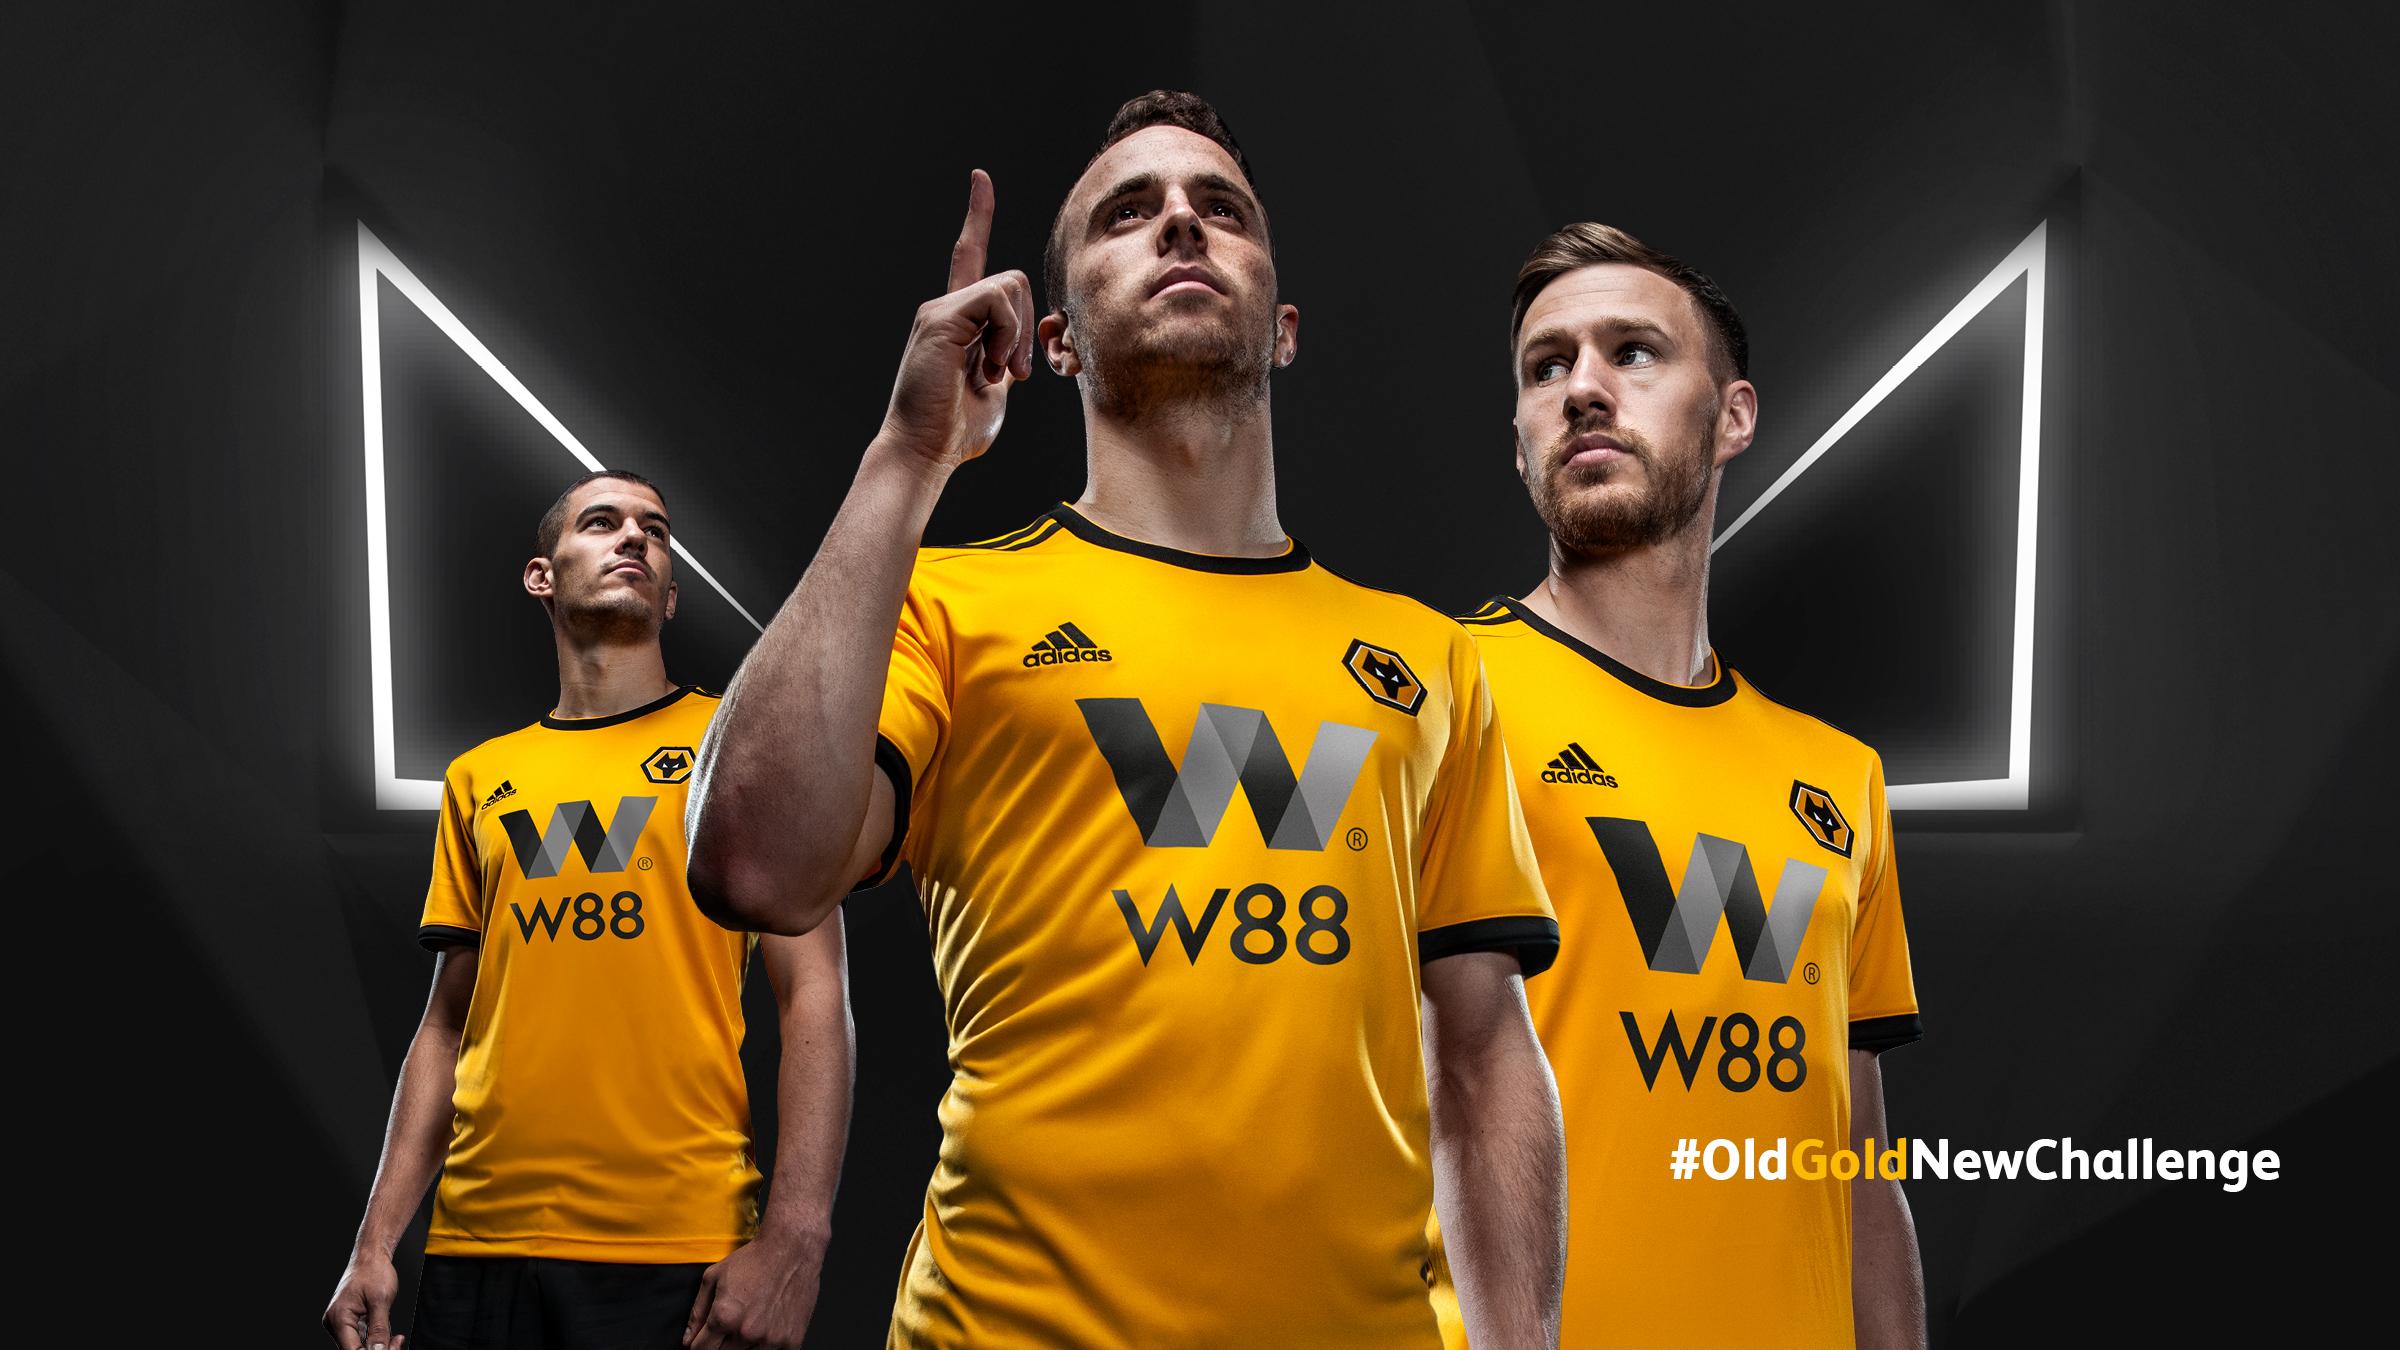 Wolverhampton Wanderers 2018 19 Home and Away Kits by Adidas fbda654ad